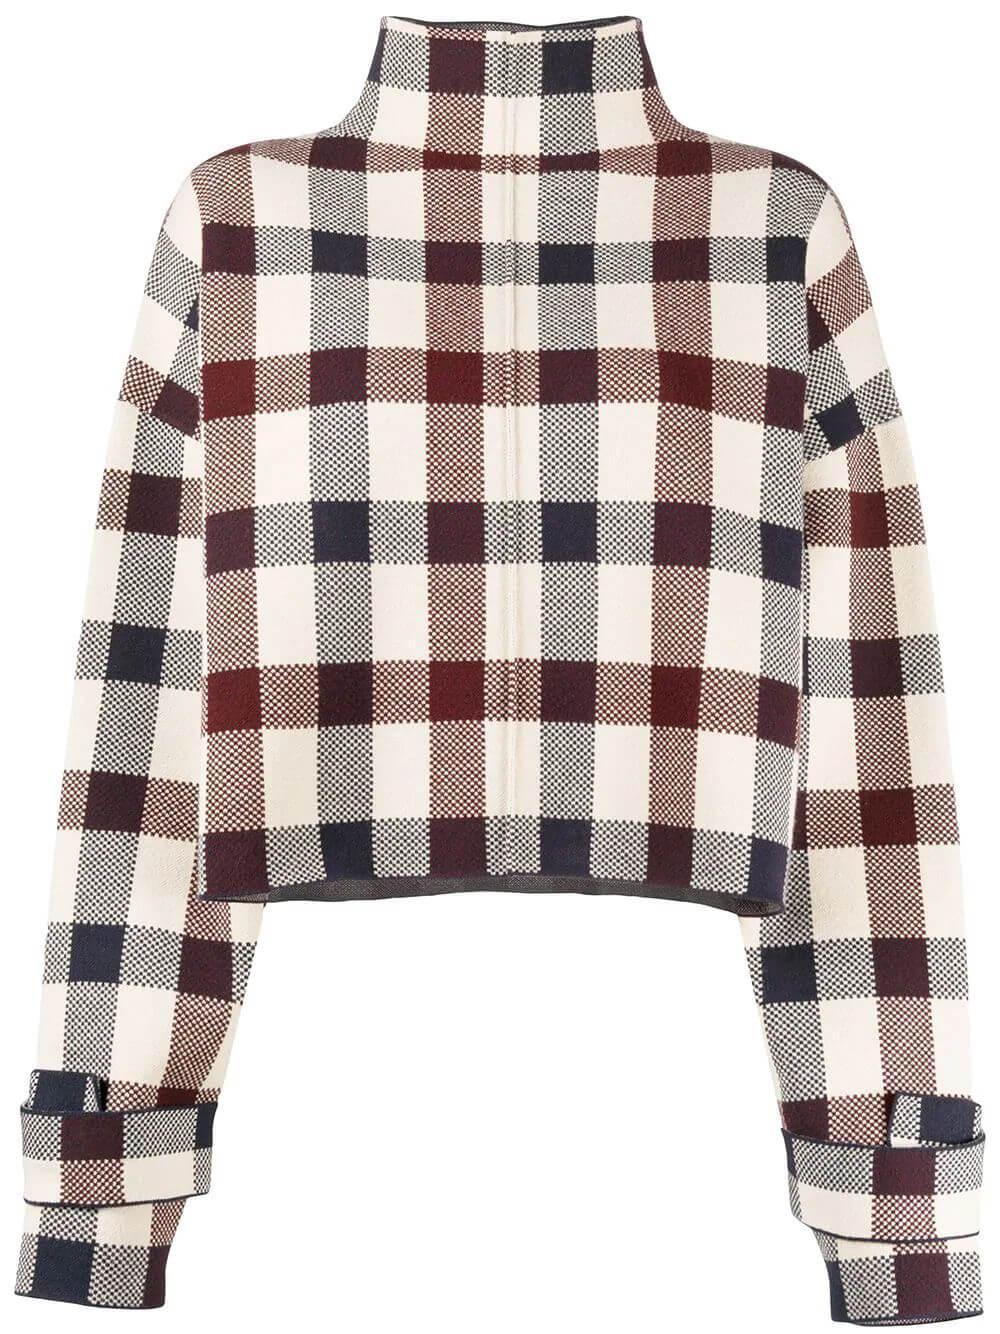 Long Sleeve Funnel Neck Plaid Sweater Item # 2320KJU001520A